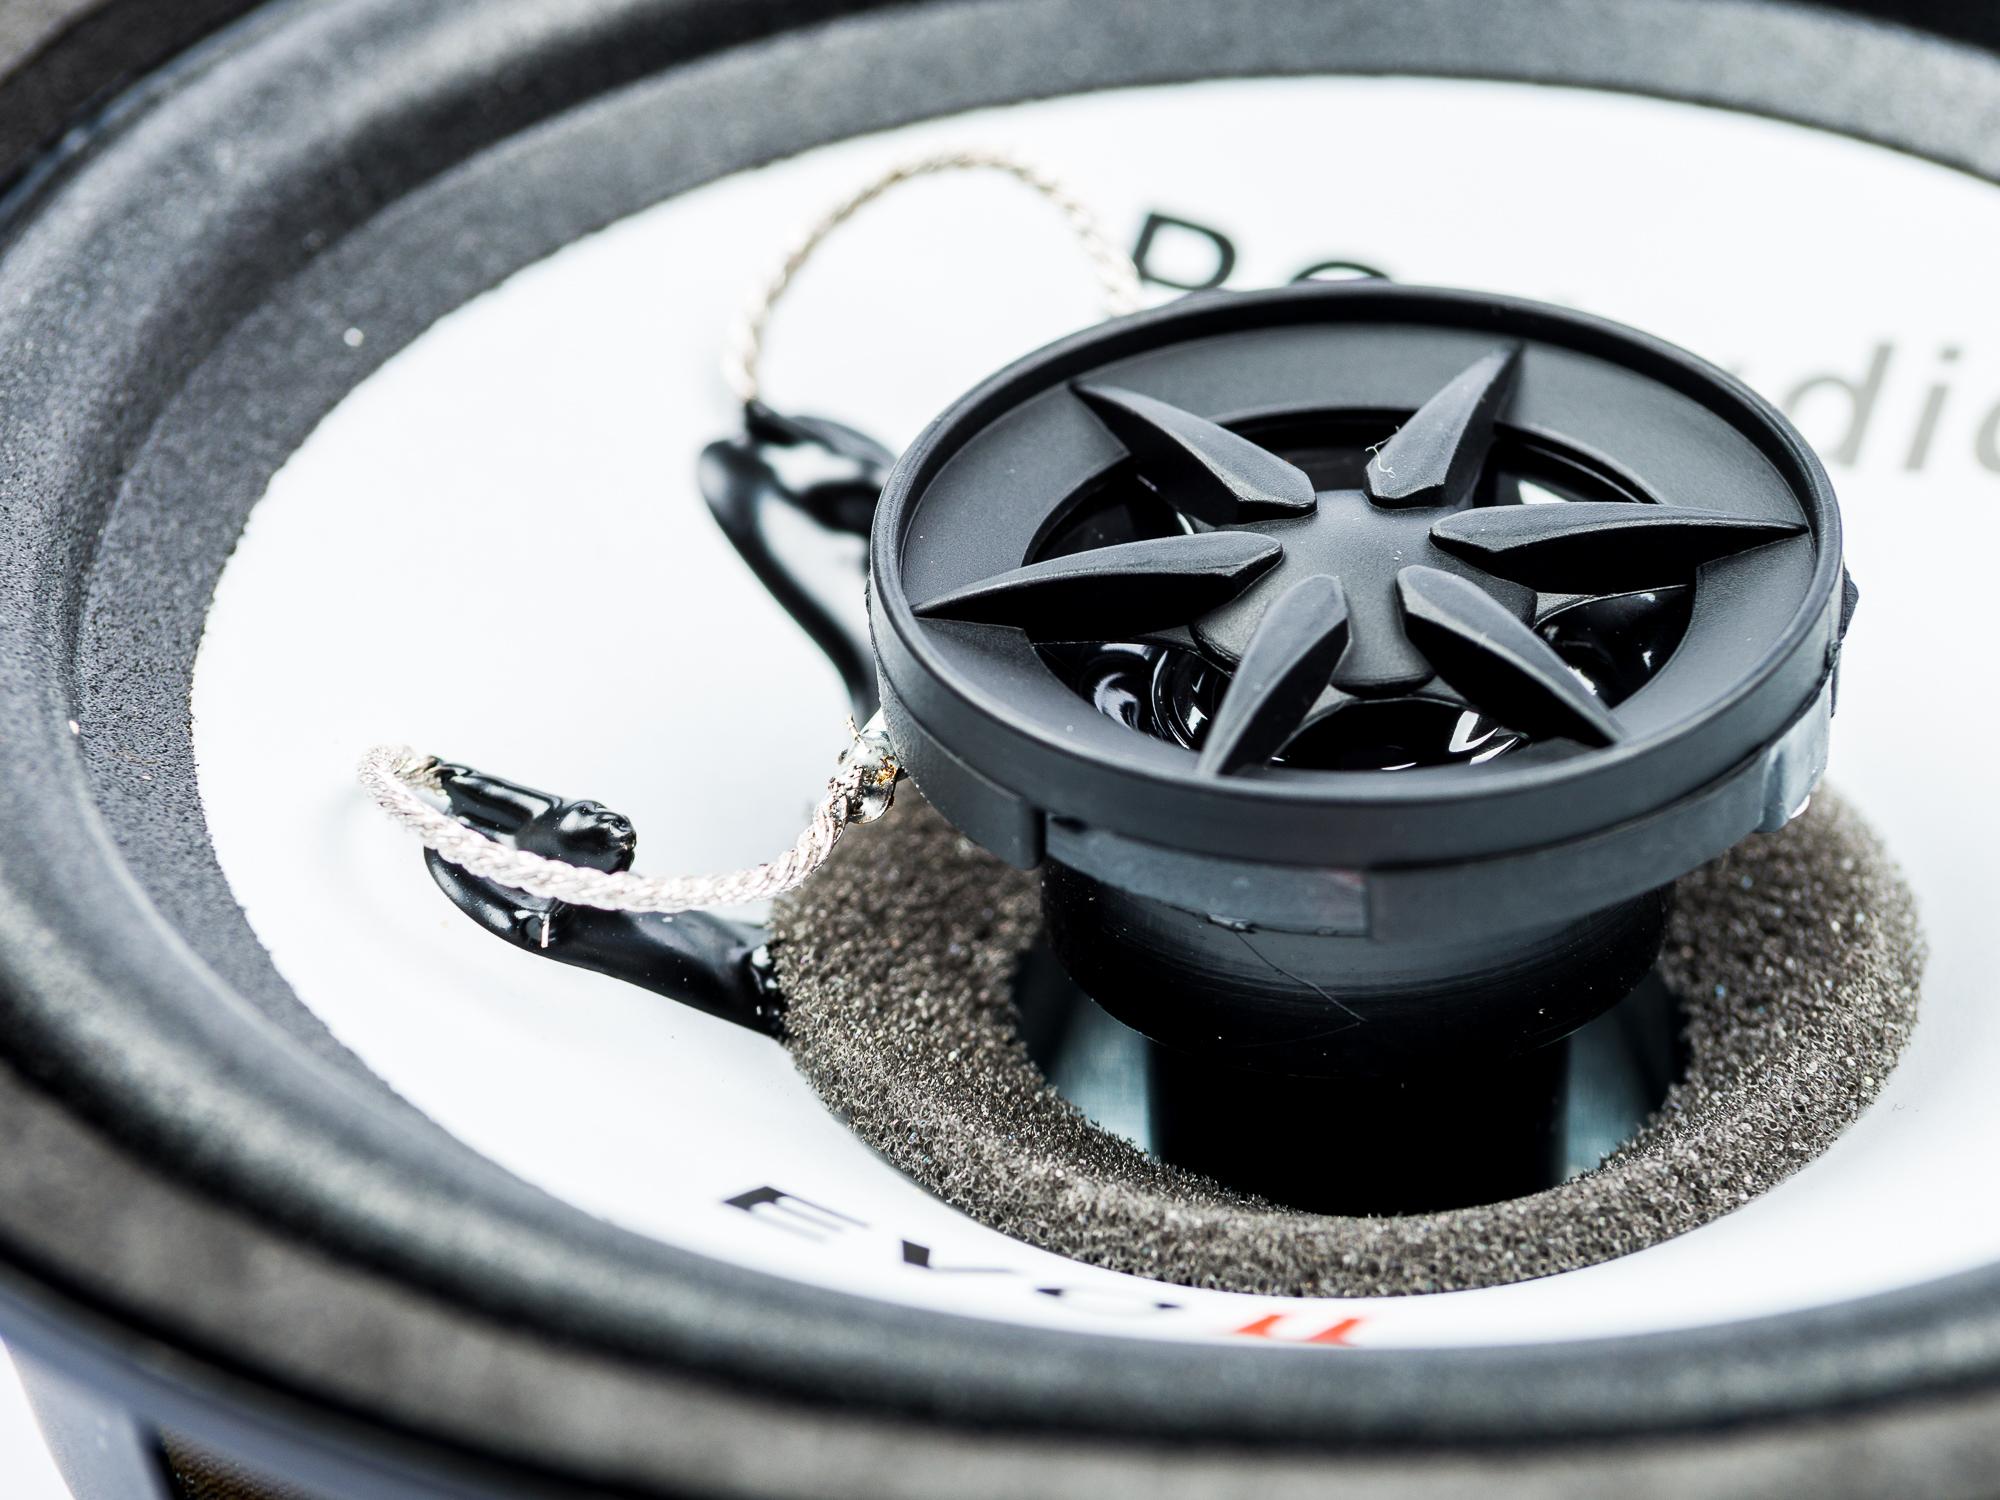 Audi A3 ab 2003 A4 & Avant Toyota Yaris  Lautsprecher Einbauset vorne, PG Audio – Bild 4